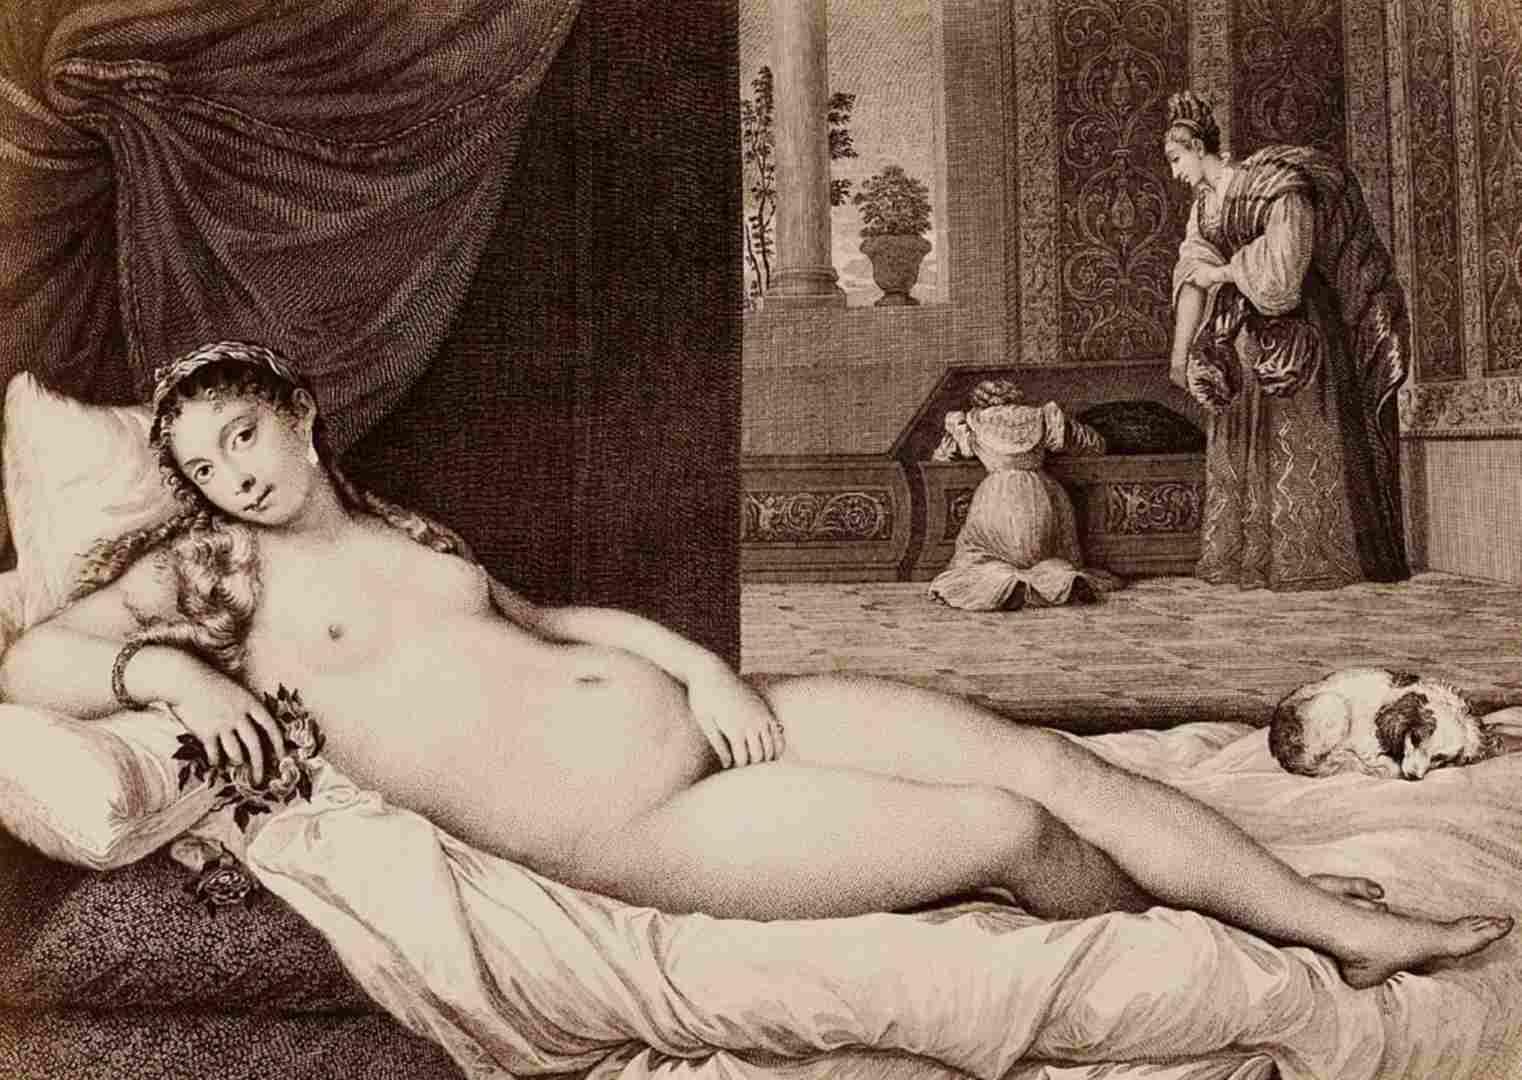 ונוס (אפרודיטה) של טיציאן